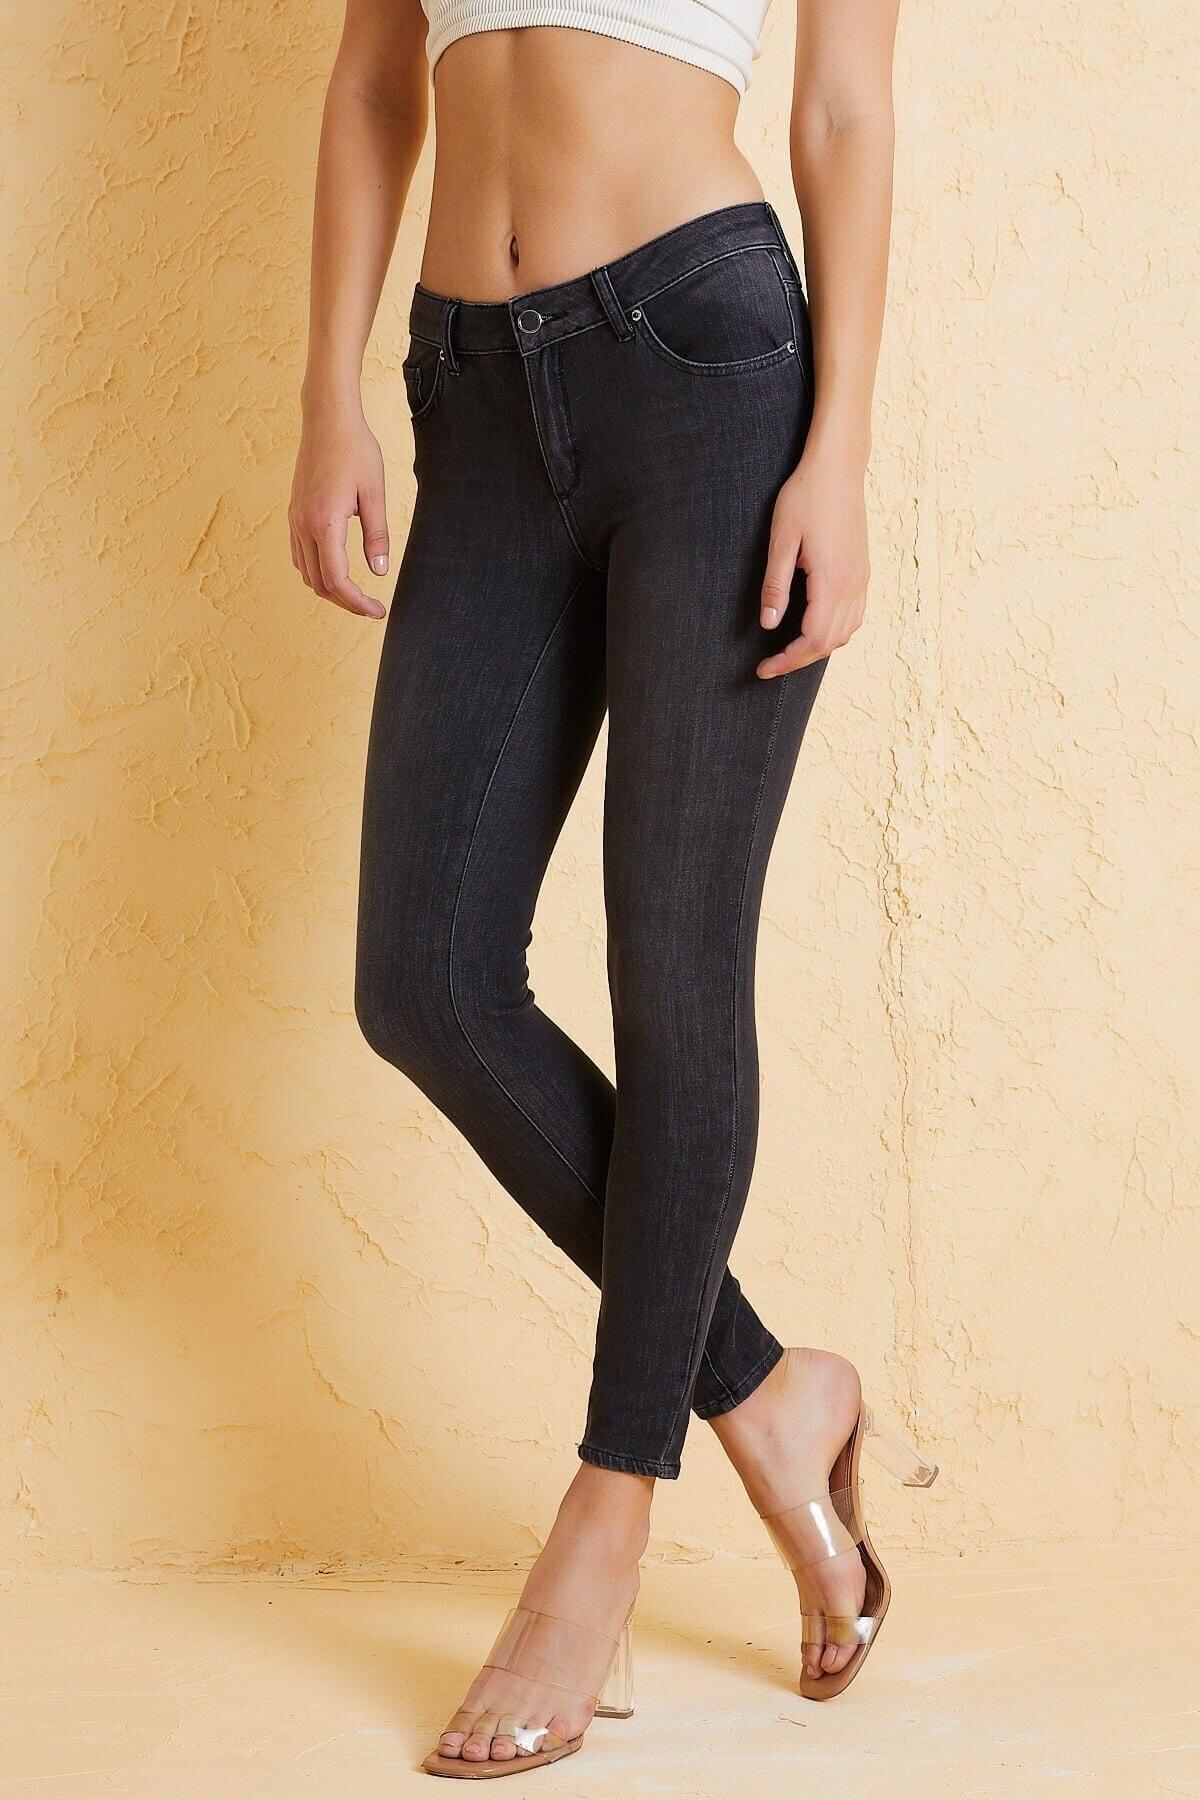 Twister Jeans Kadın Siyah Orta Bel Pantolon 9046-81 2